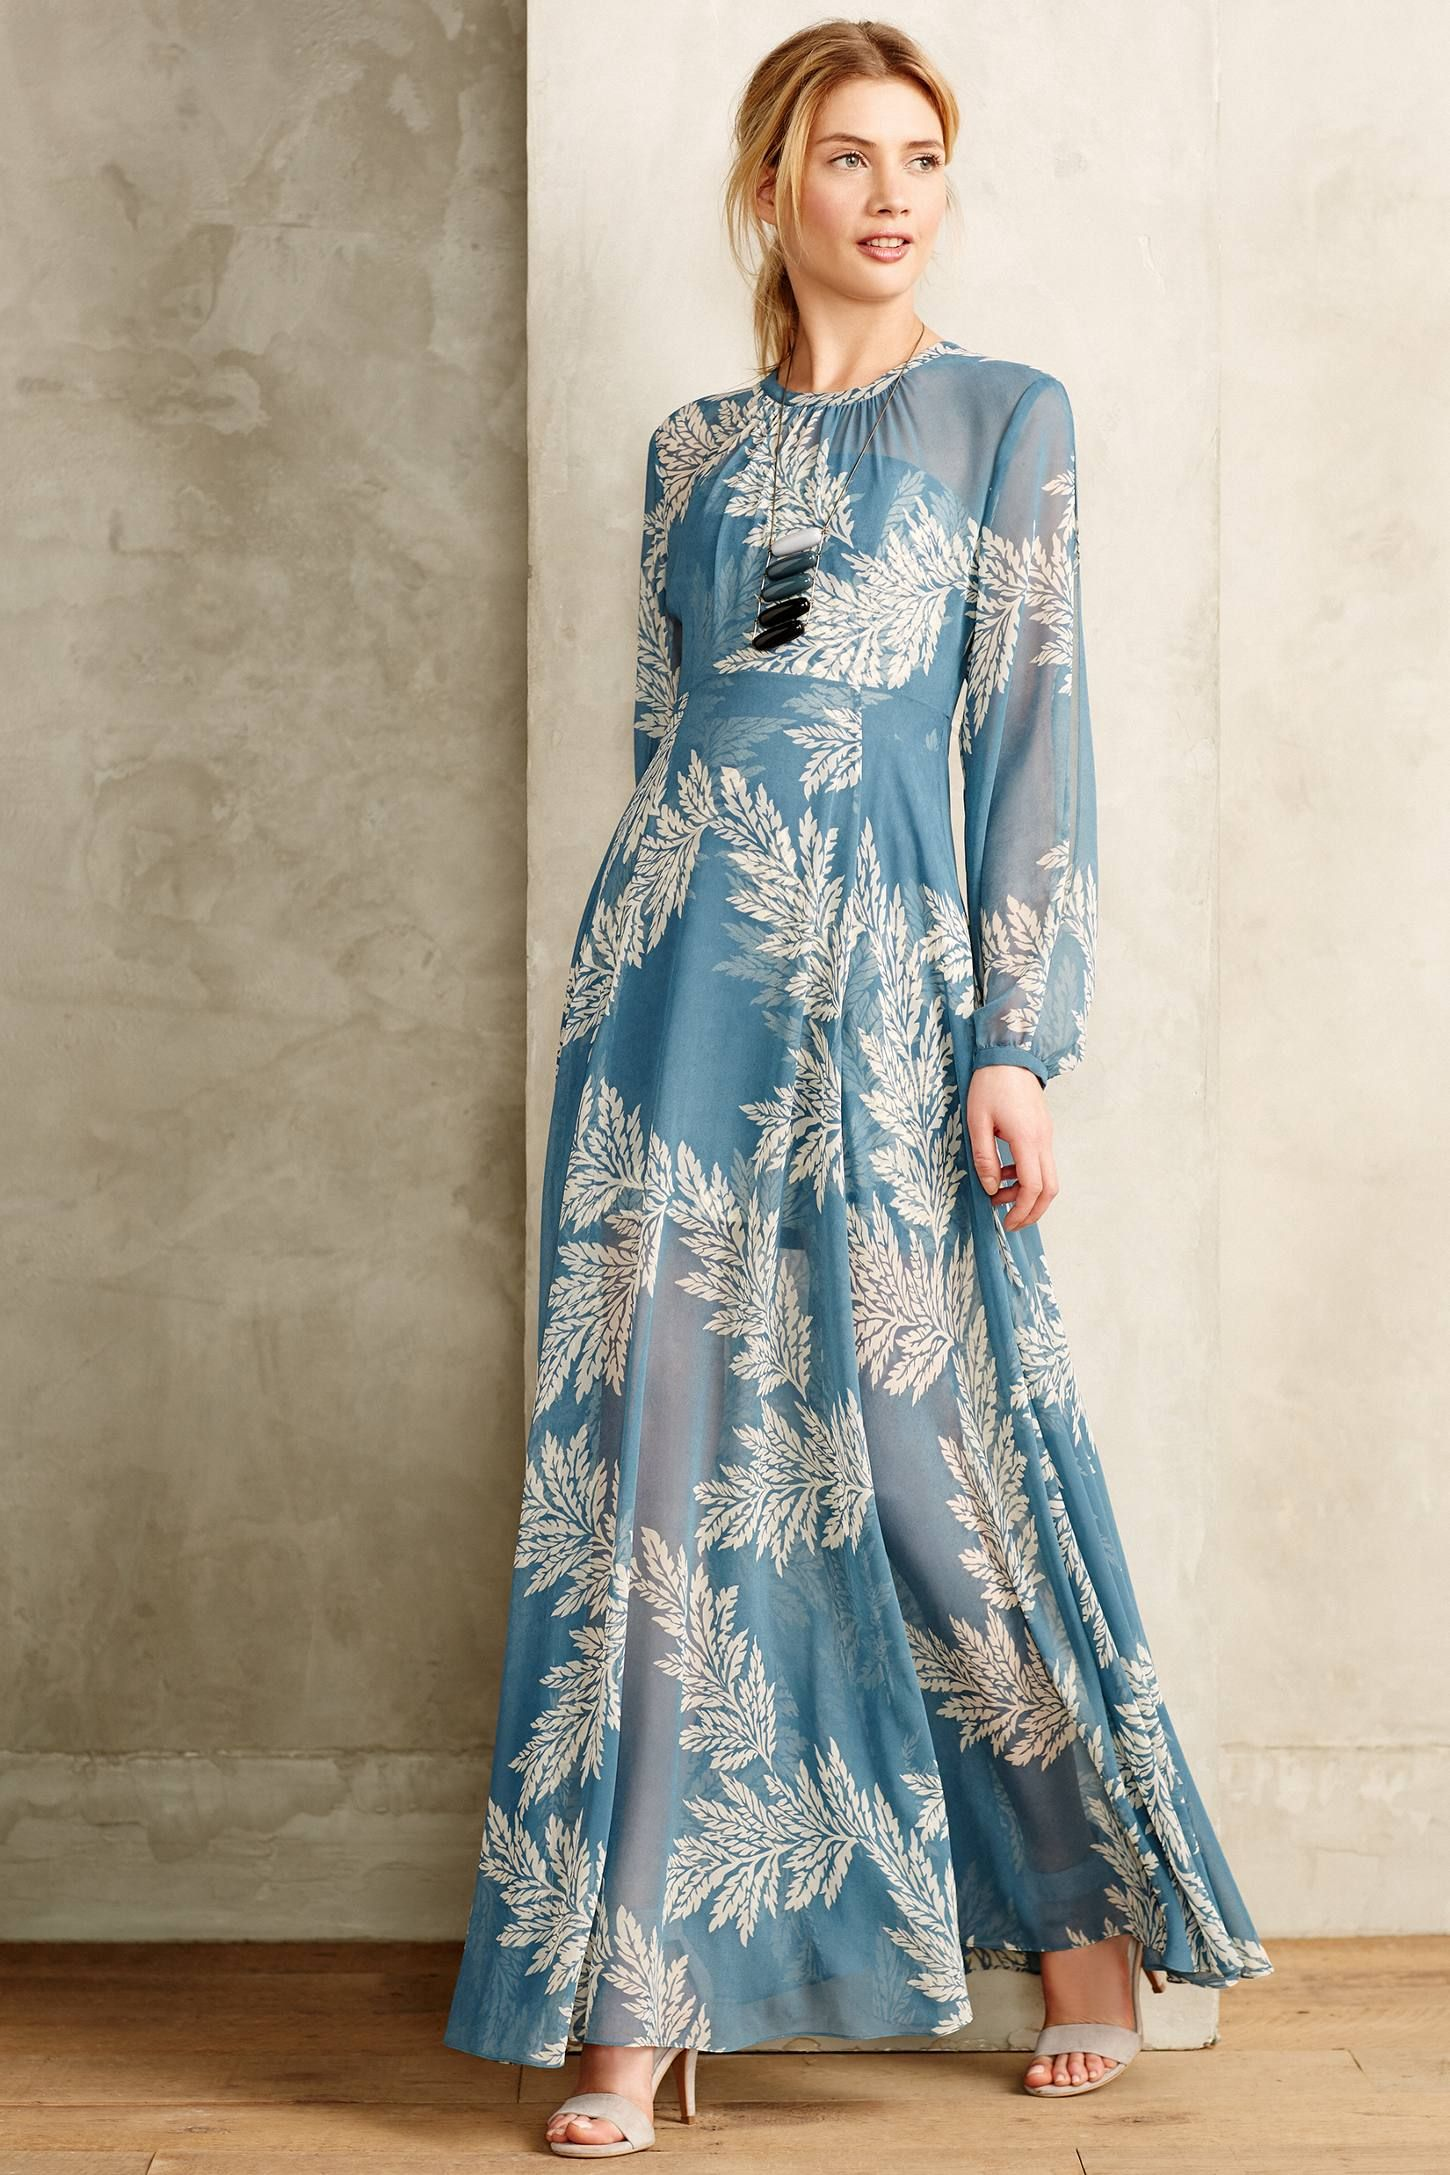 Conservatoire Dress - anthropologie.com | Art / Fashion | Pinterest ...